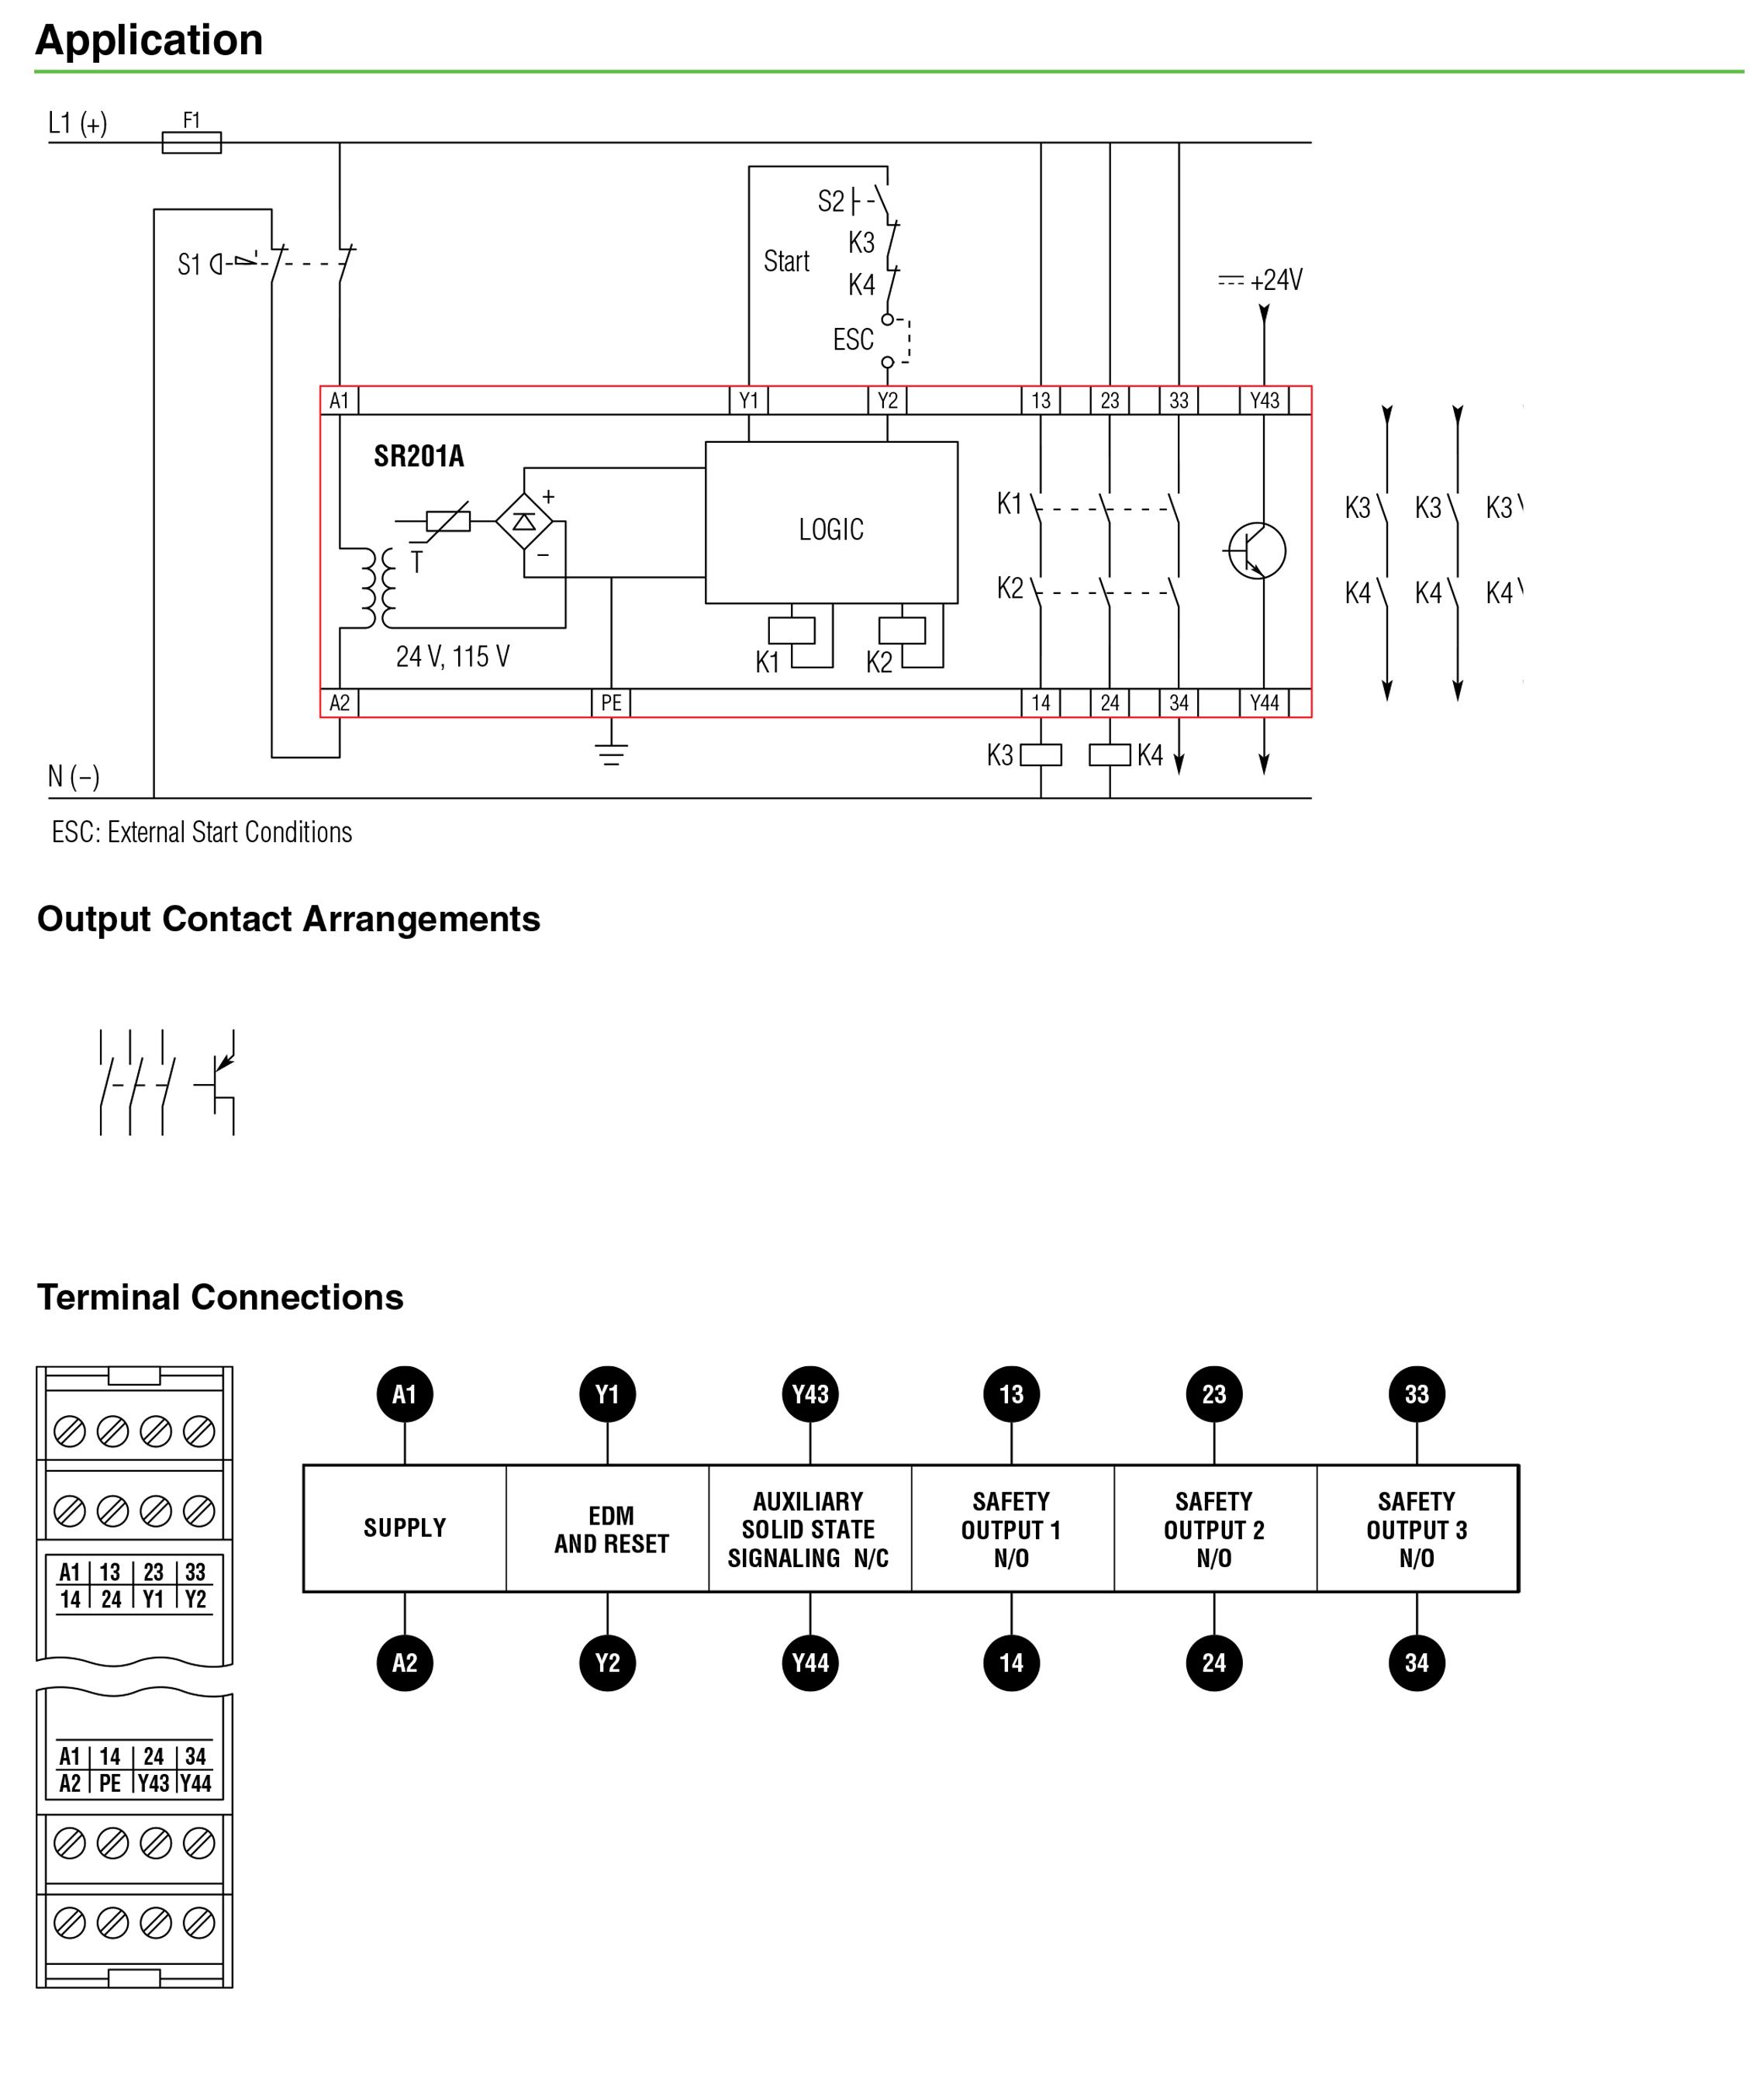 SR201A_Application.jpg